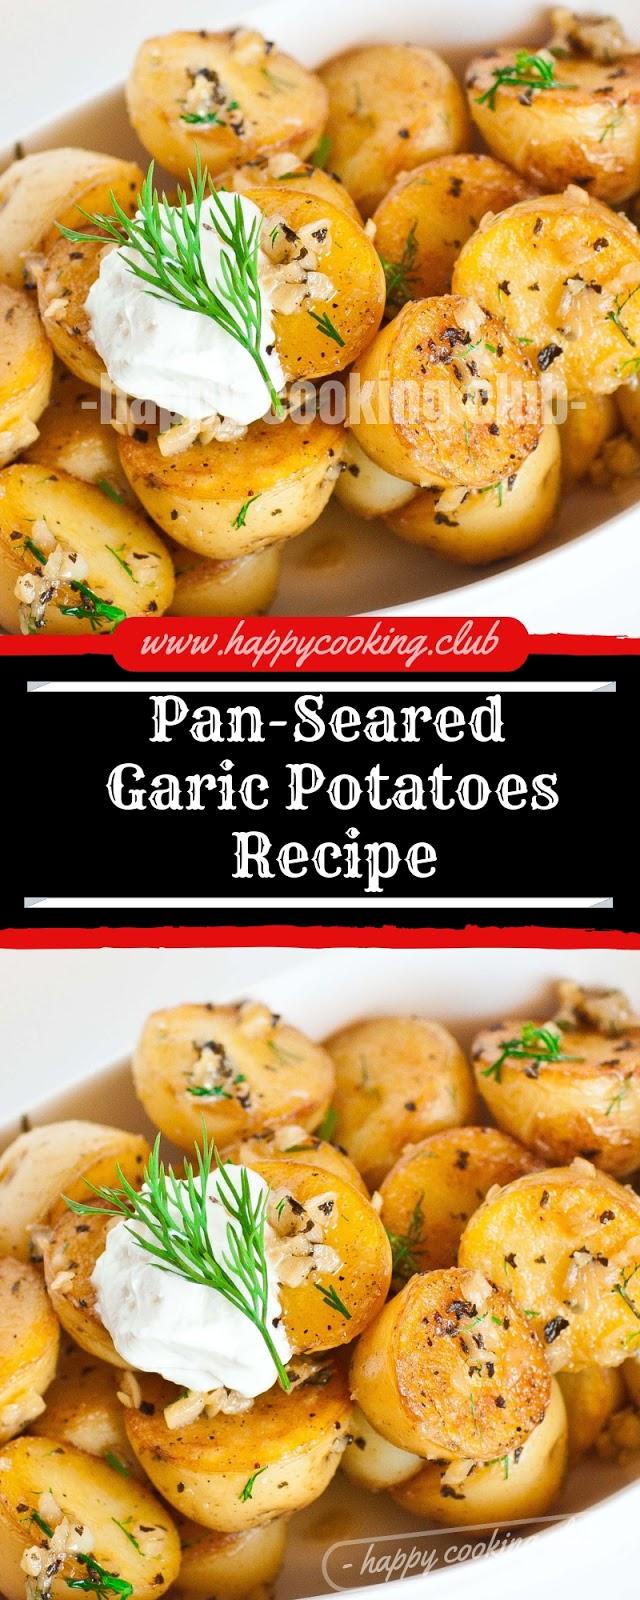 Pan-Seared Garic Potatoes Recipe